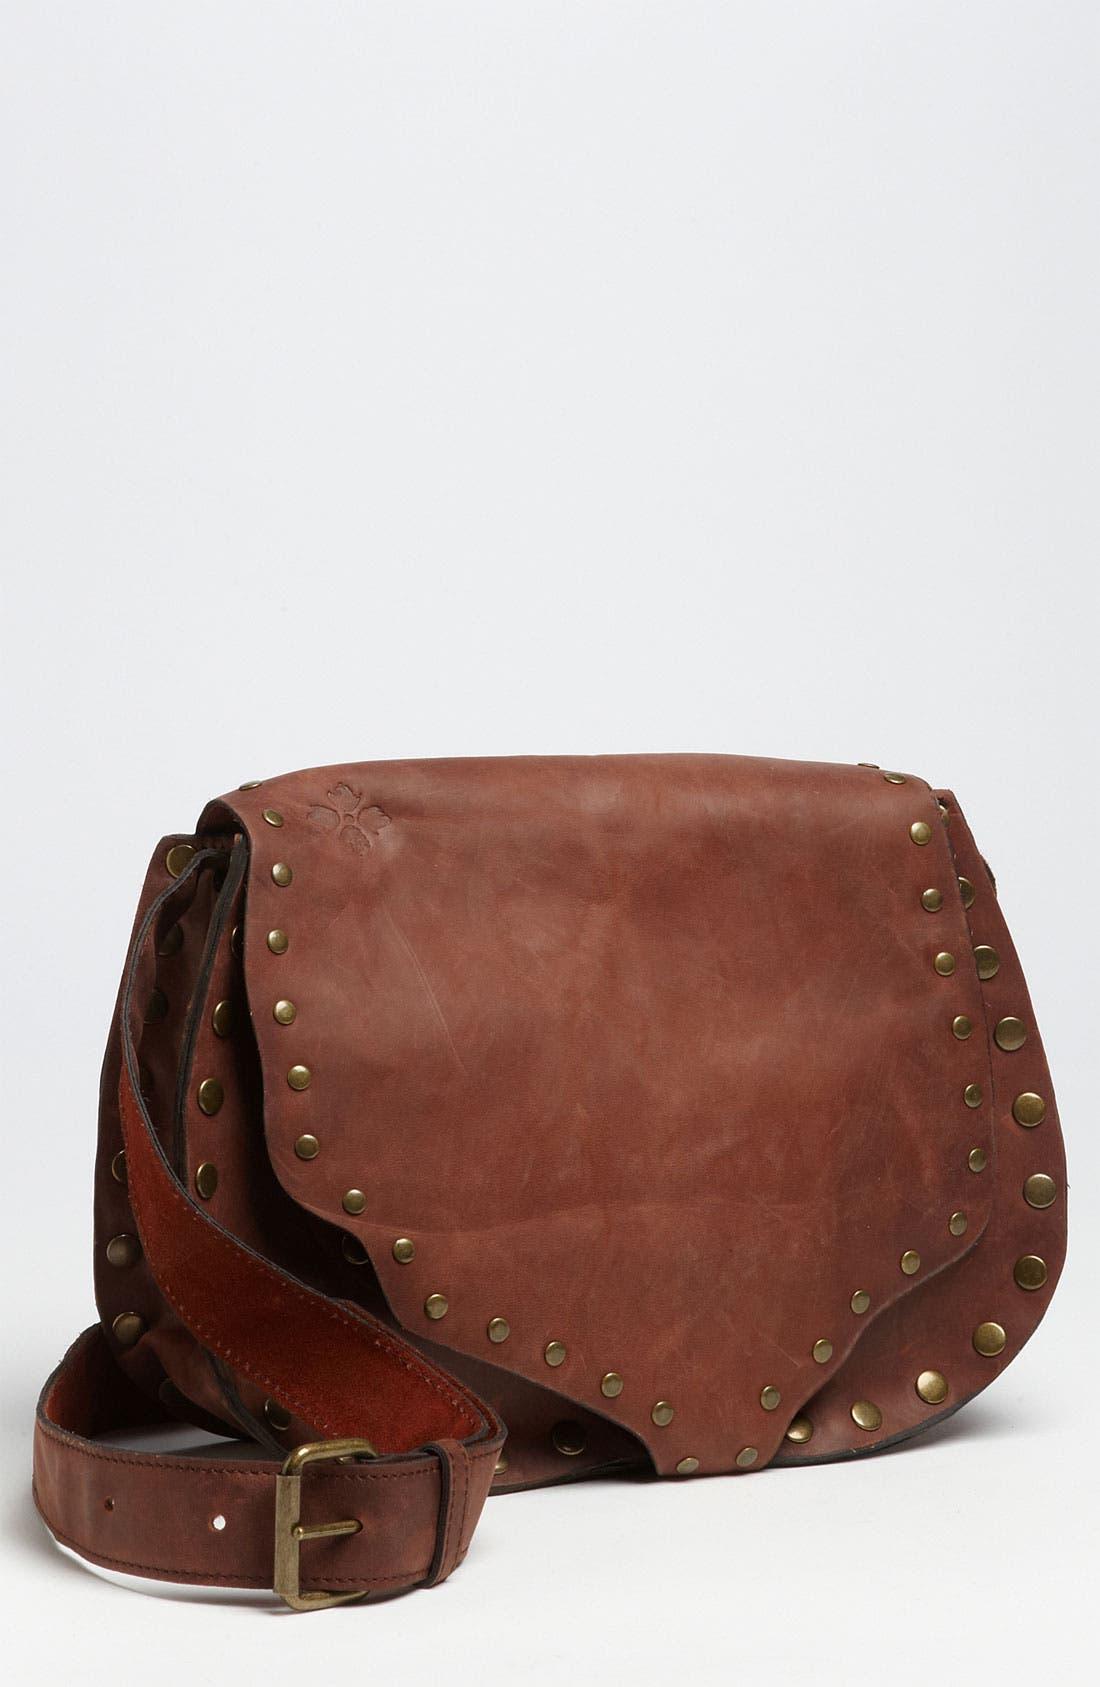 Alternate Image 1 Selected - Patricia Nash 'Berlino' Crossbody Bag